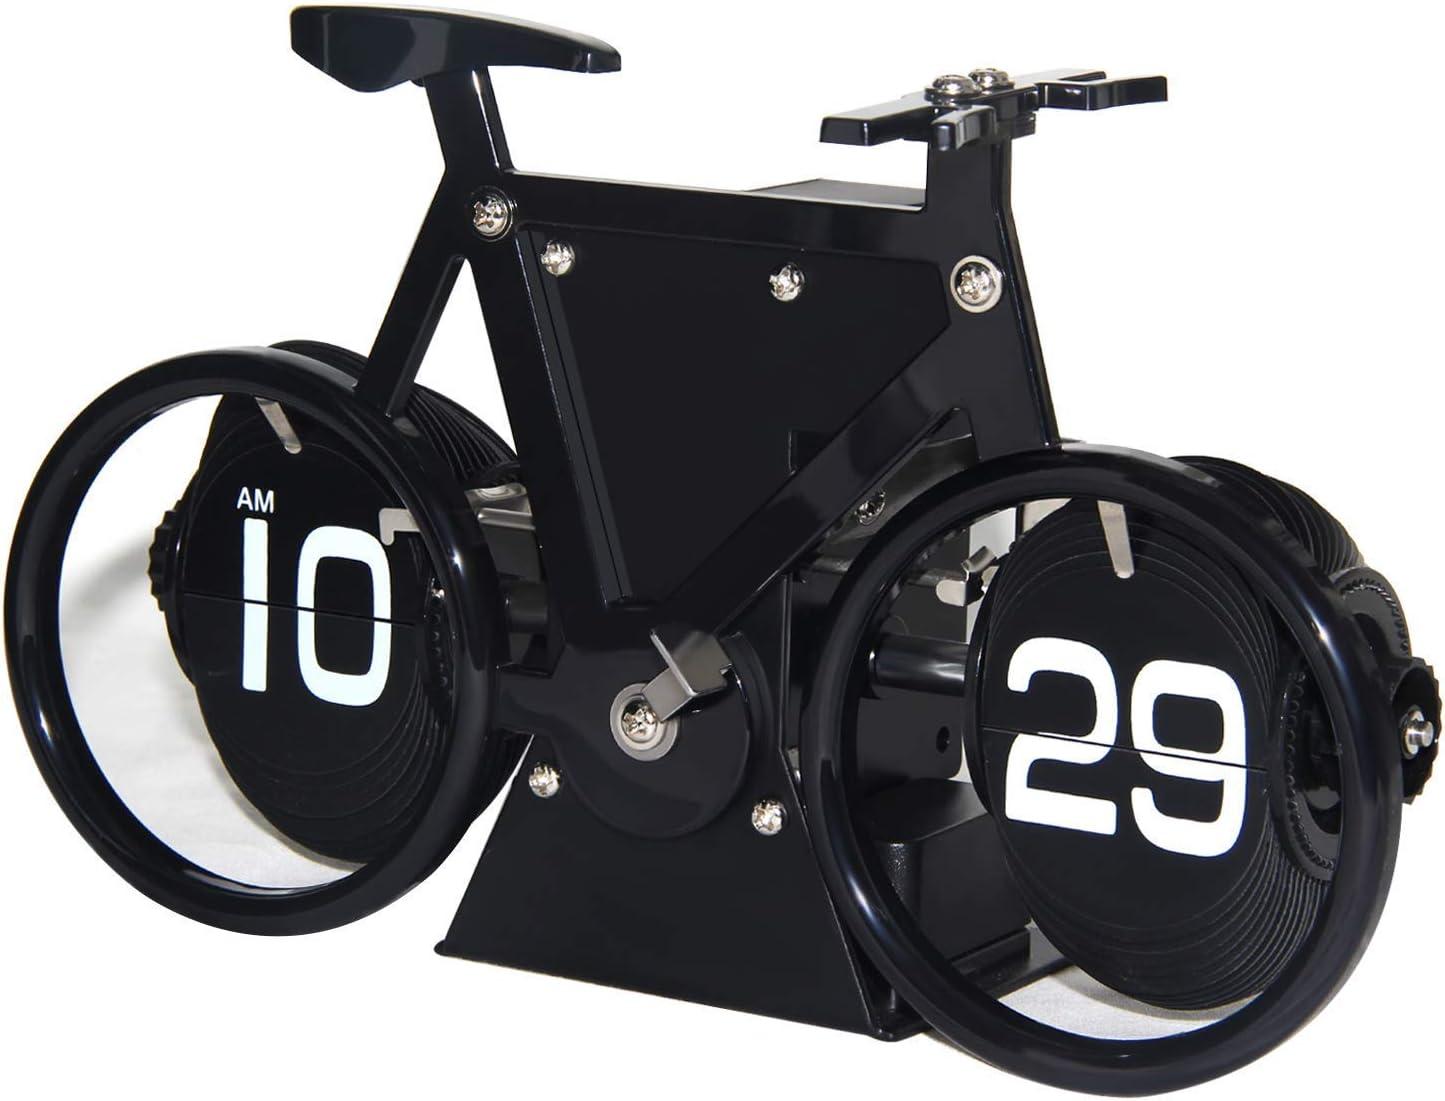 Black Mechanical Flip Down Desk Clock Bicycle Vintage Decor Desktop Clocks Battery Operated for Living Room Table Office Shelf